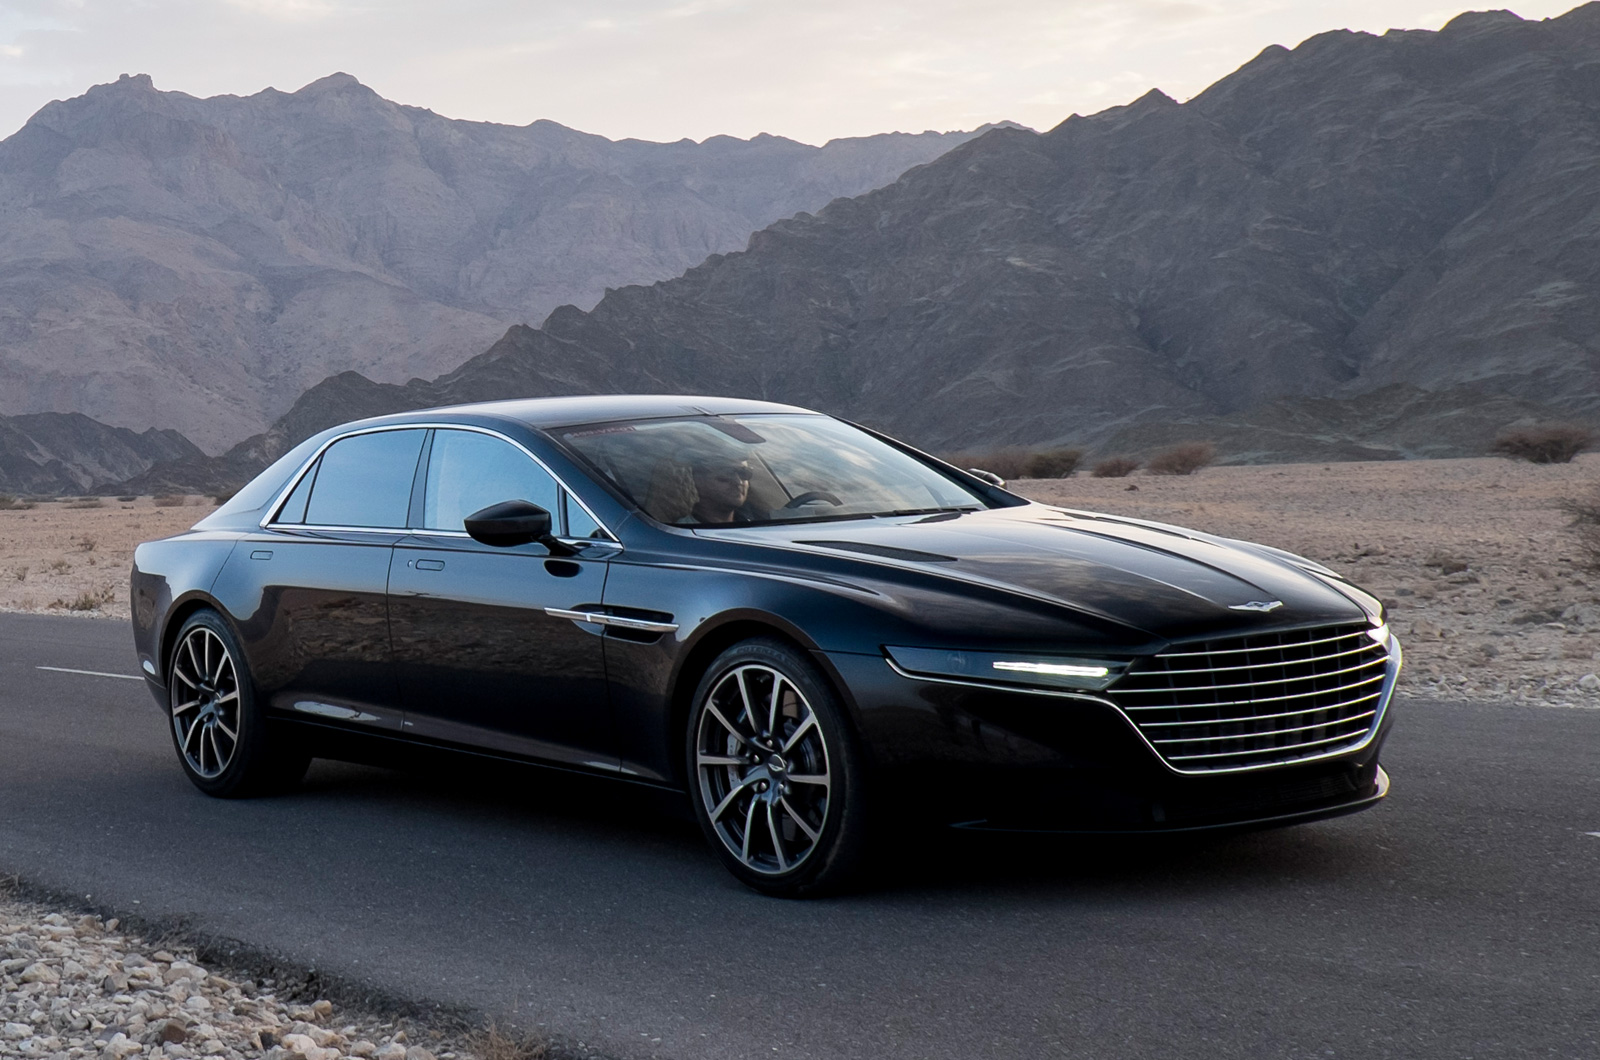 Aston Martin Shows New Lagonda Sedan 30 Photos Carscoops